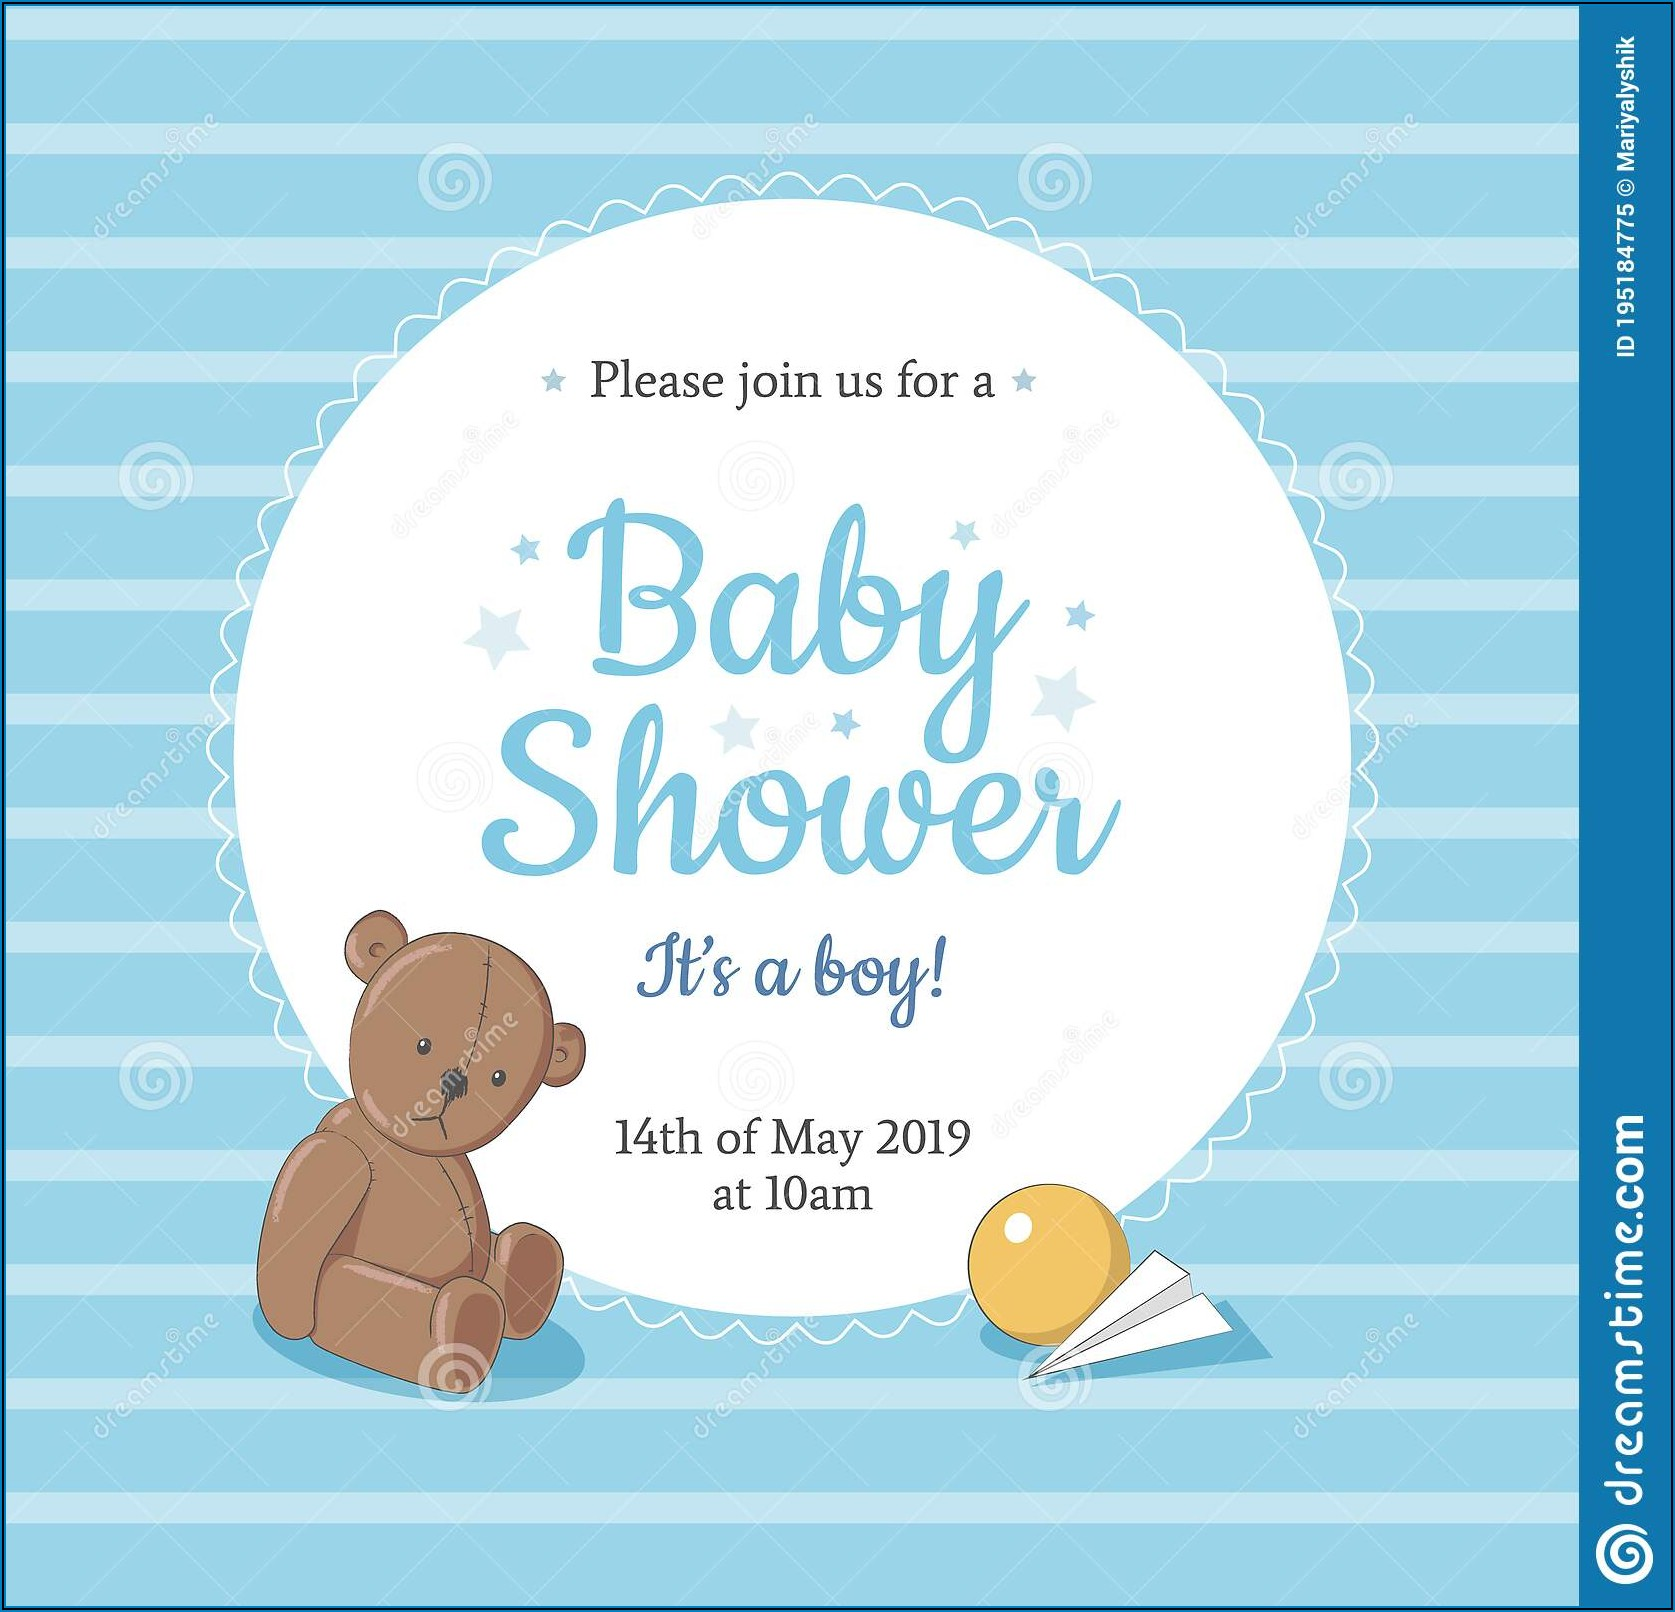 Blue Teddy Bear Invitation Templates